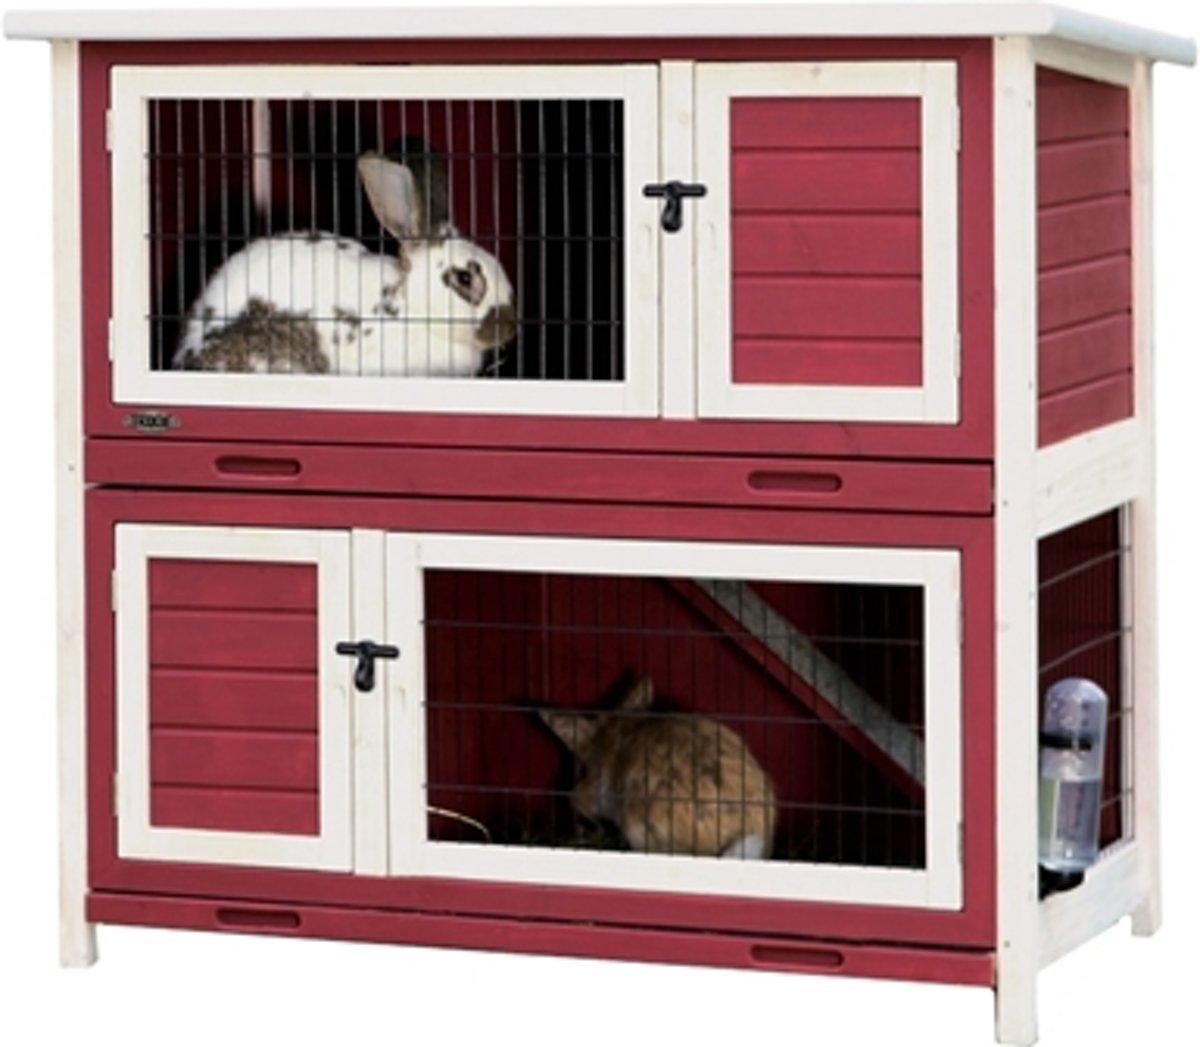 Trixie natura konijnenhok rood / wit 116x111x65 cm kopen